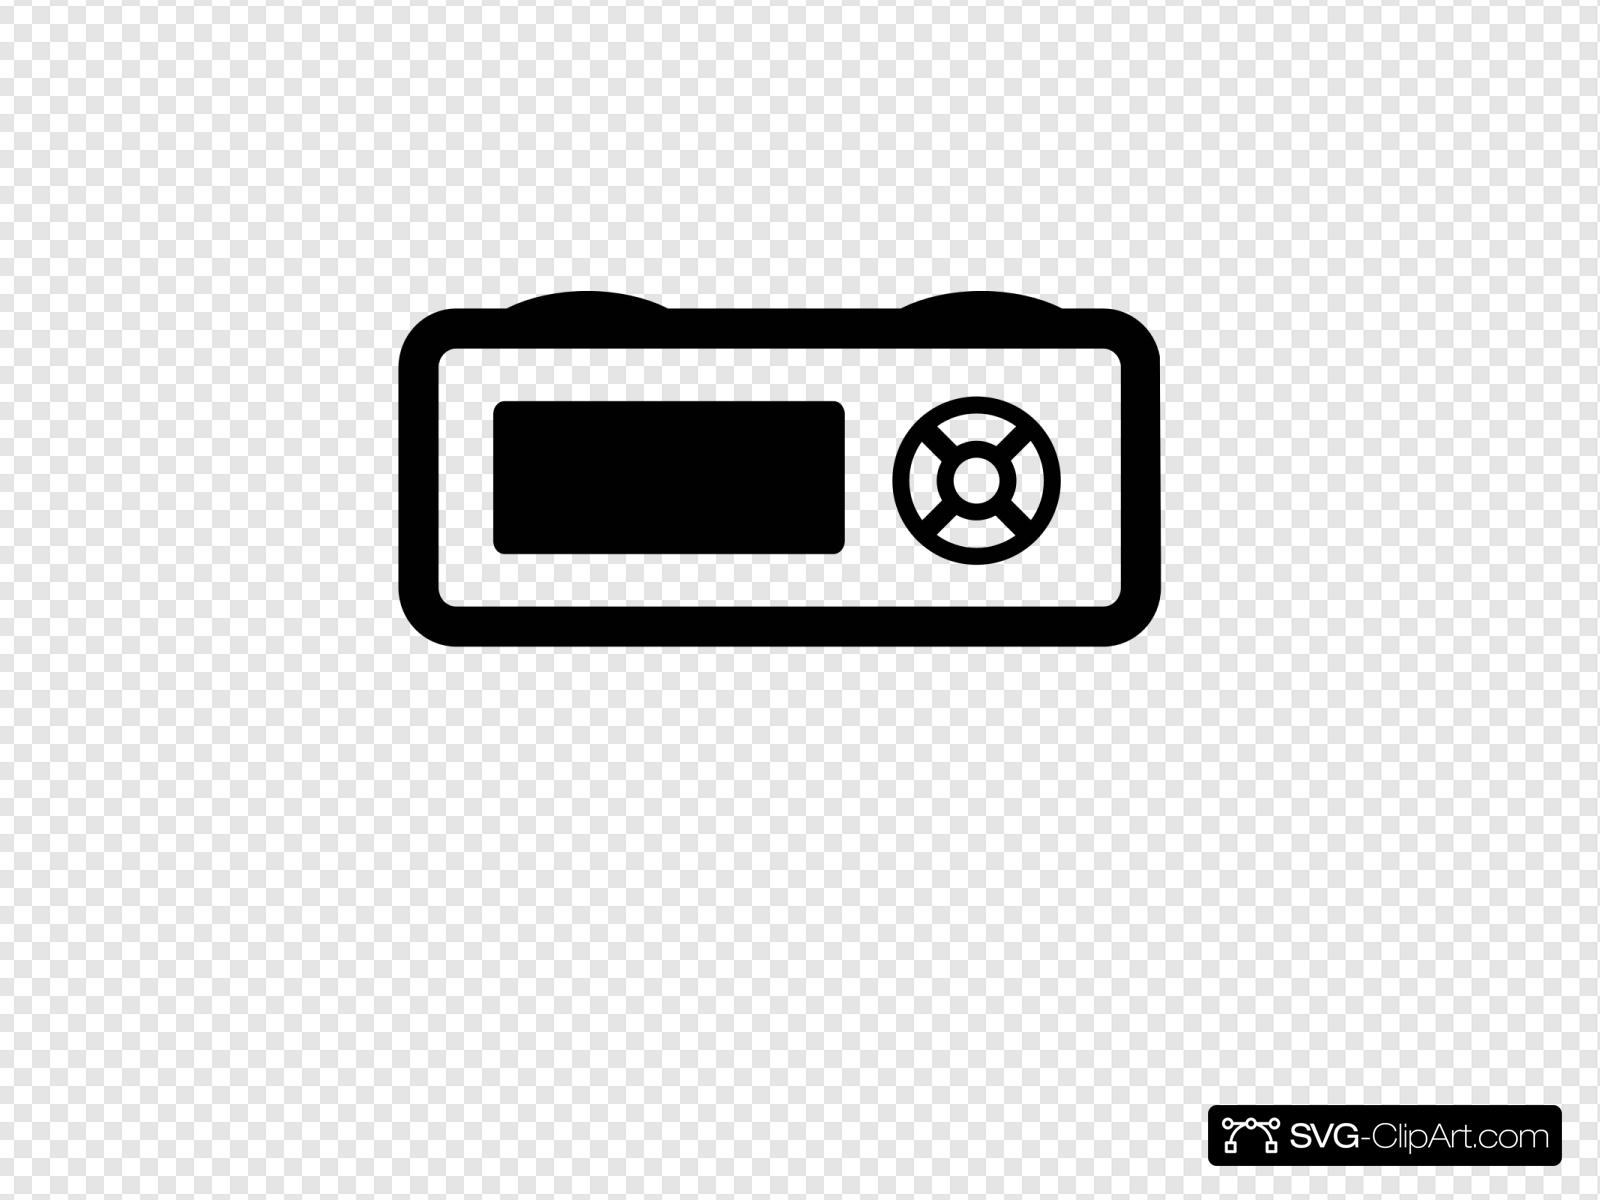 Mp3 Player Icon Clip art, Icon and SVG.